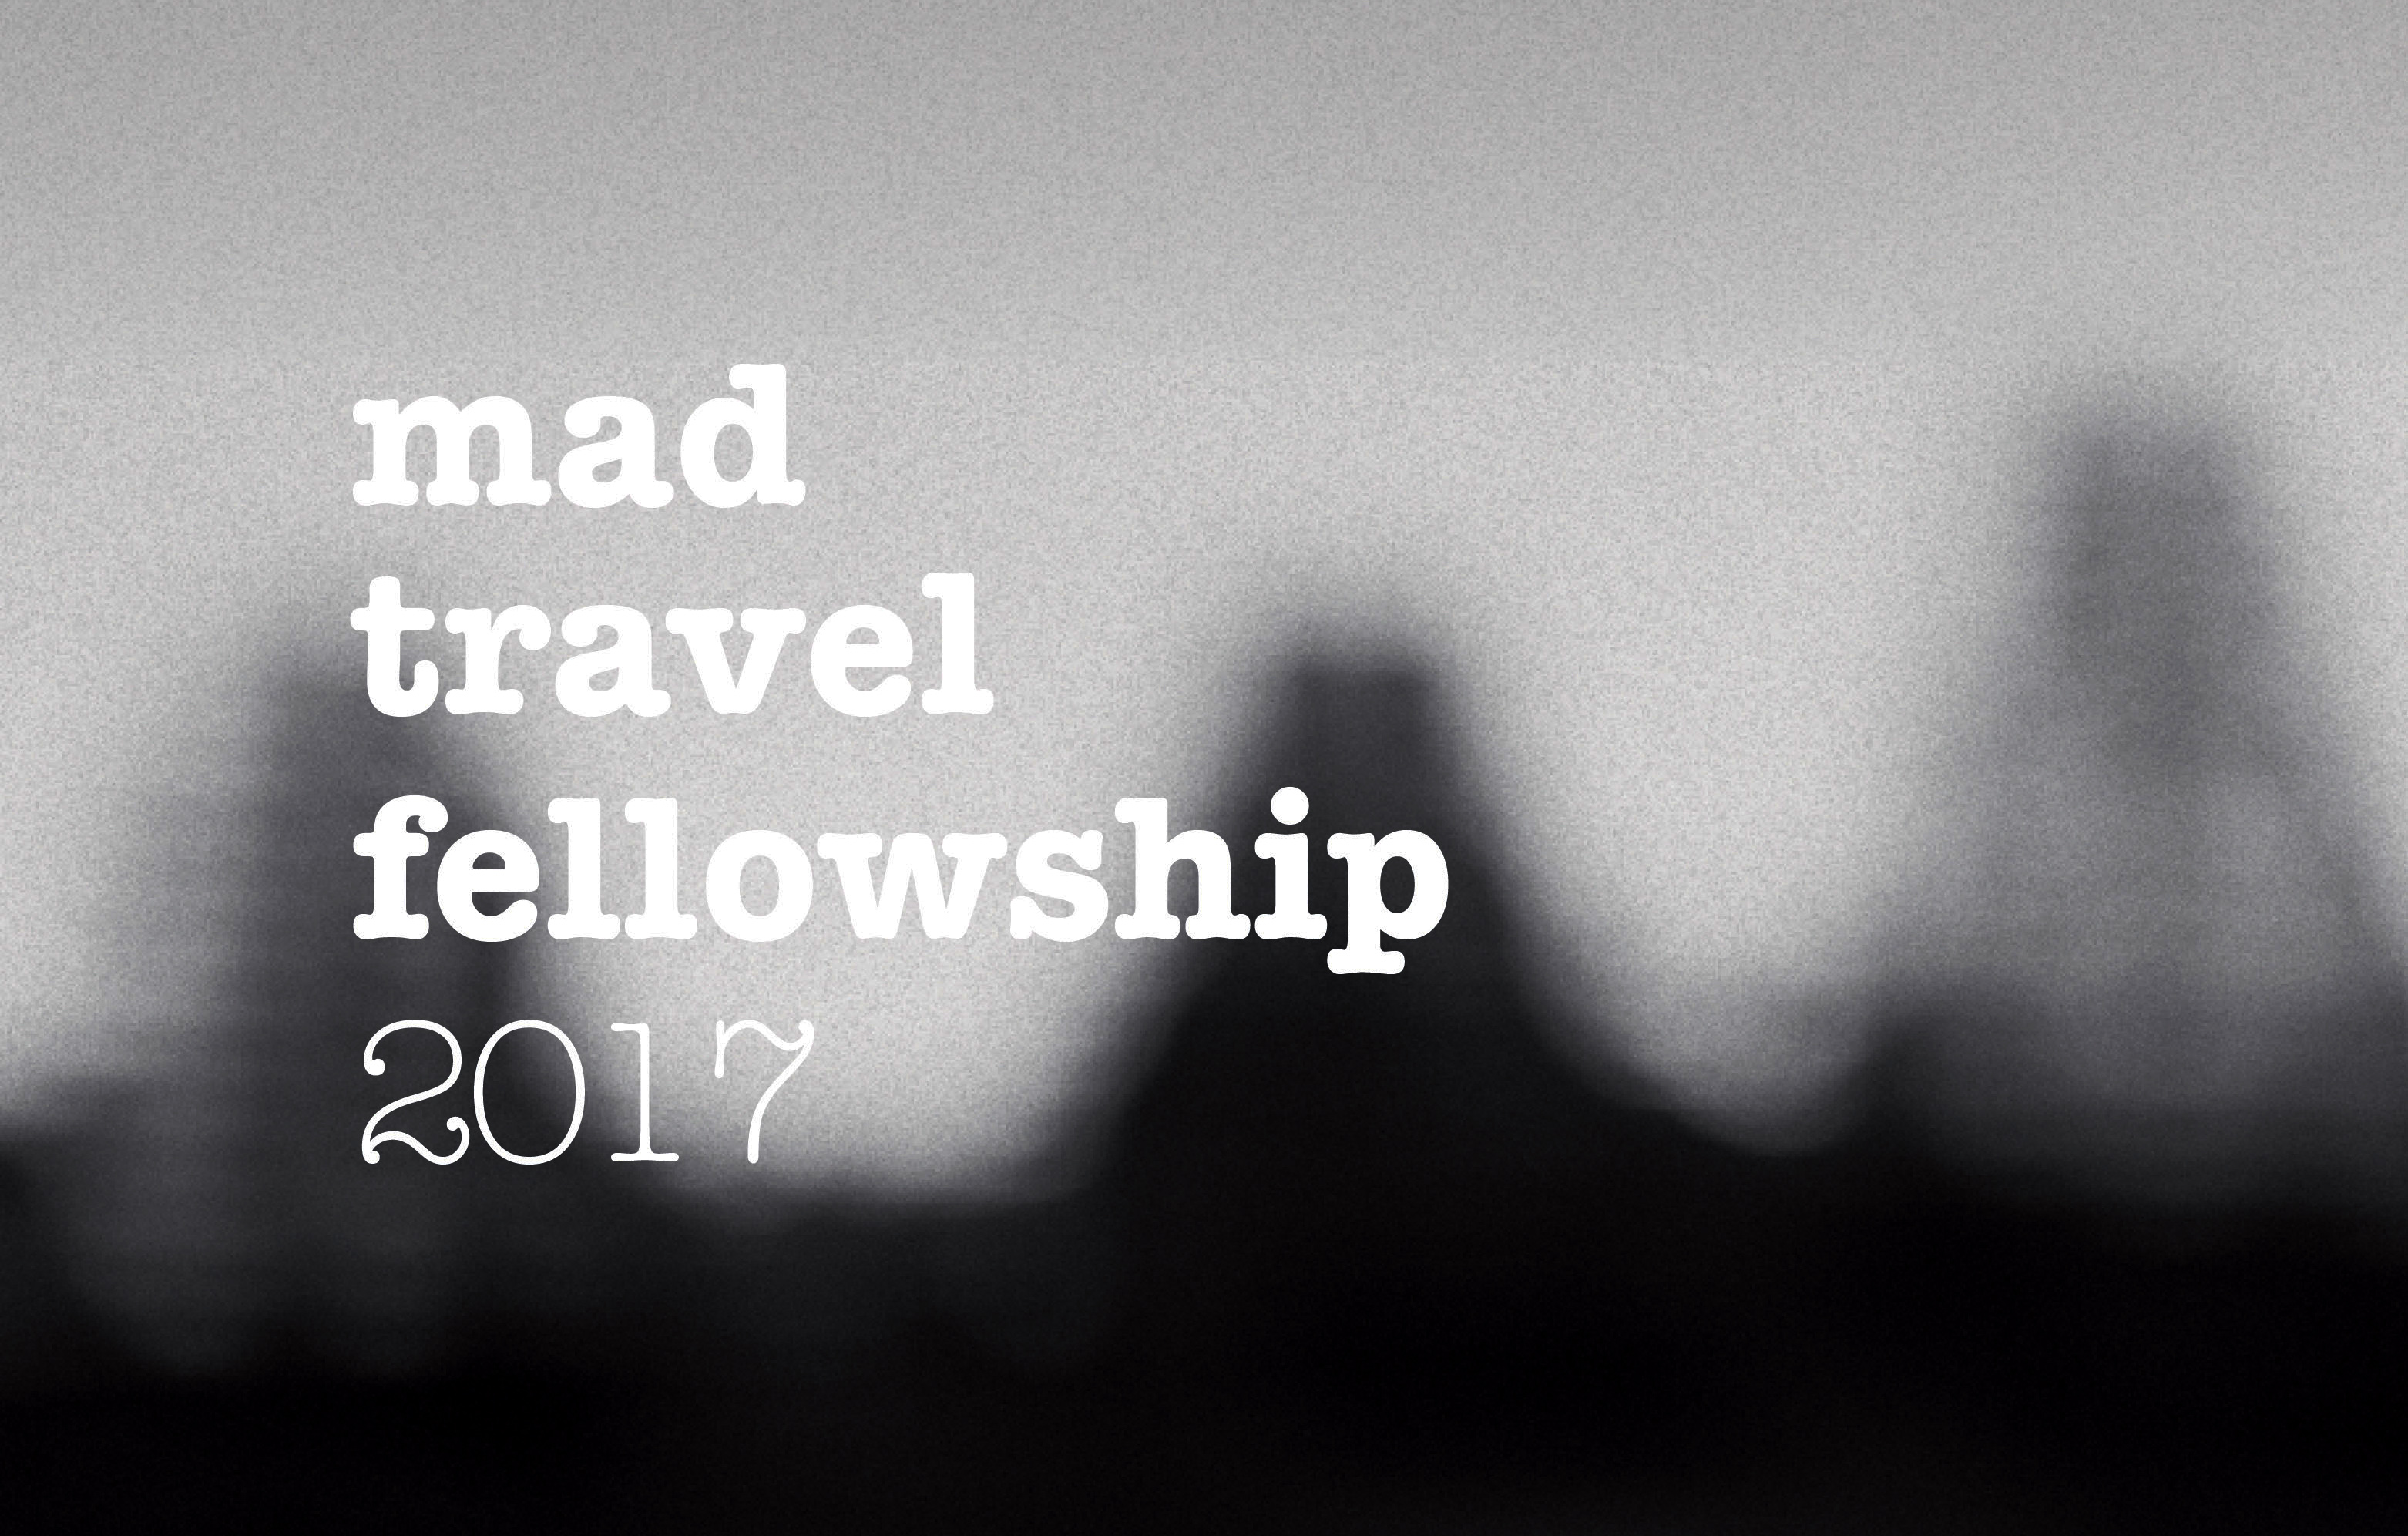 EN_2017 MAD Travel Fellowship Poster_thumbnail2